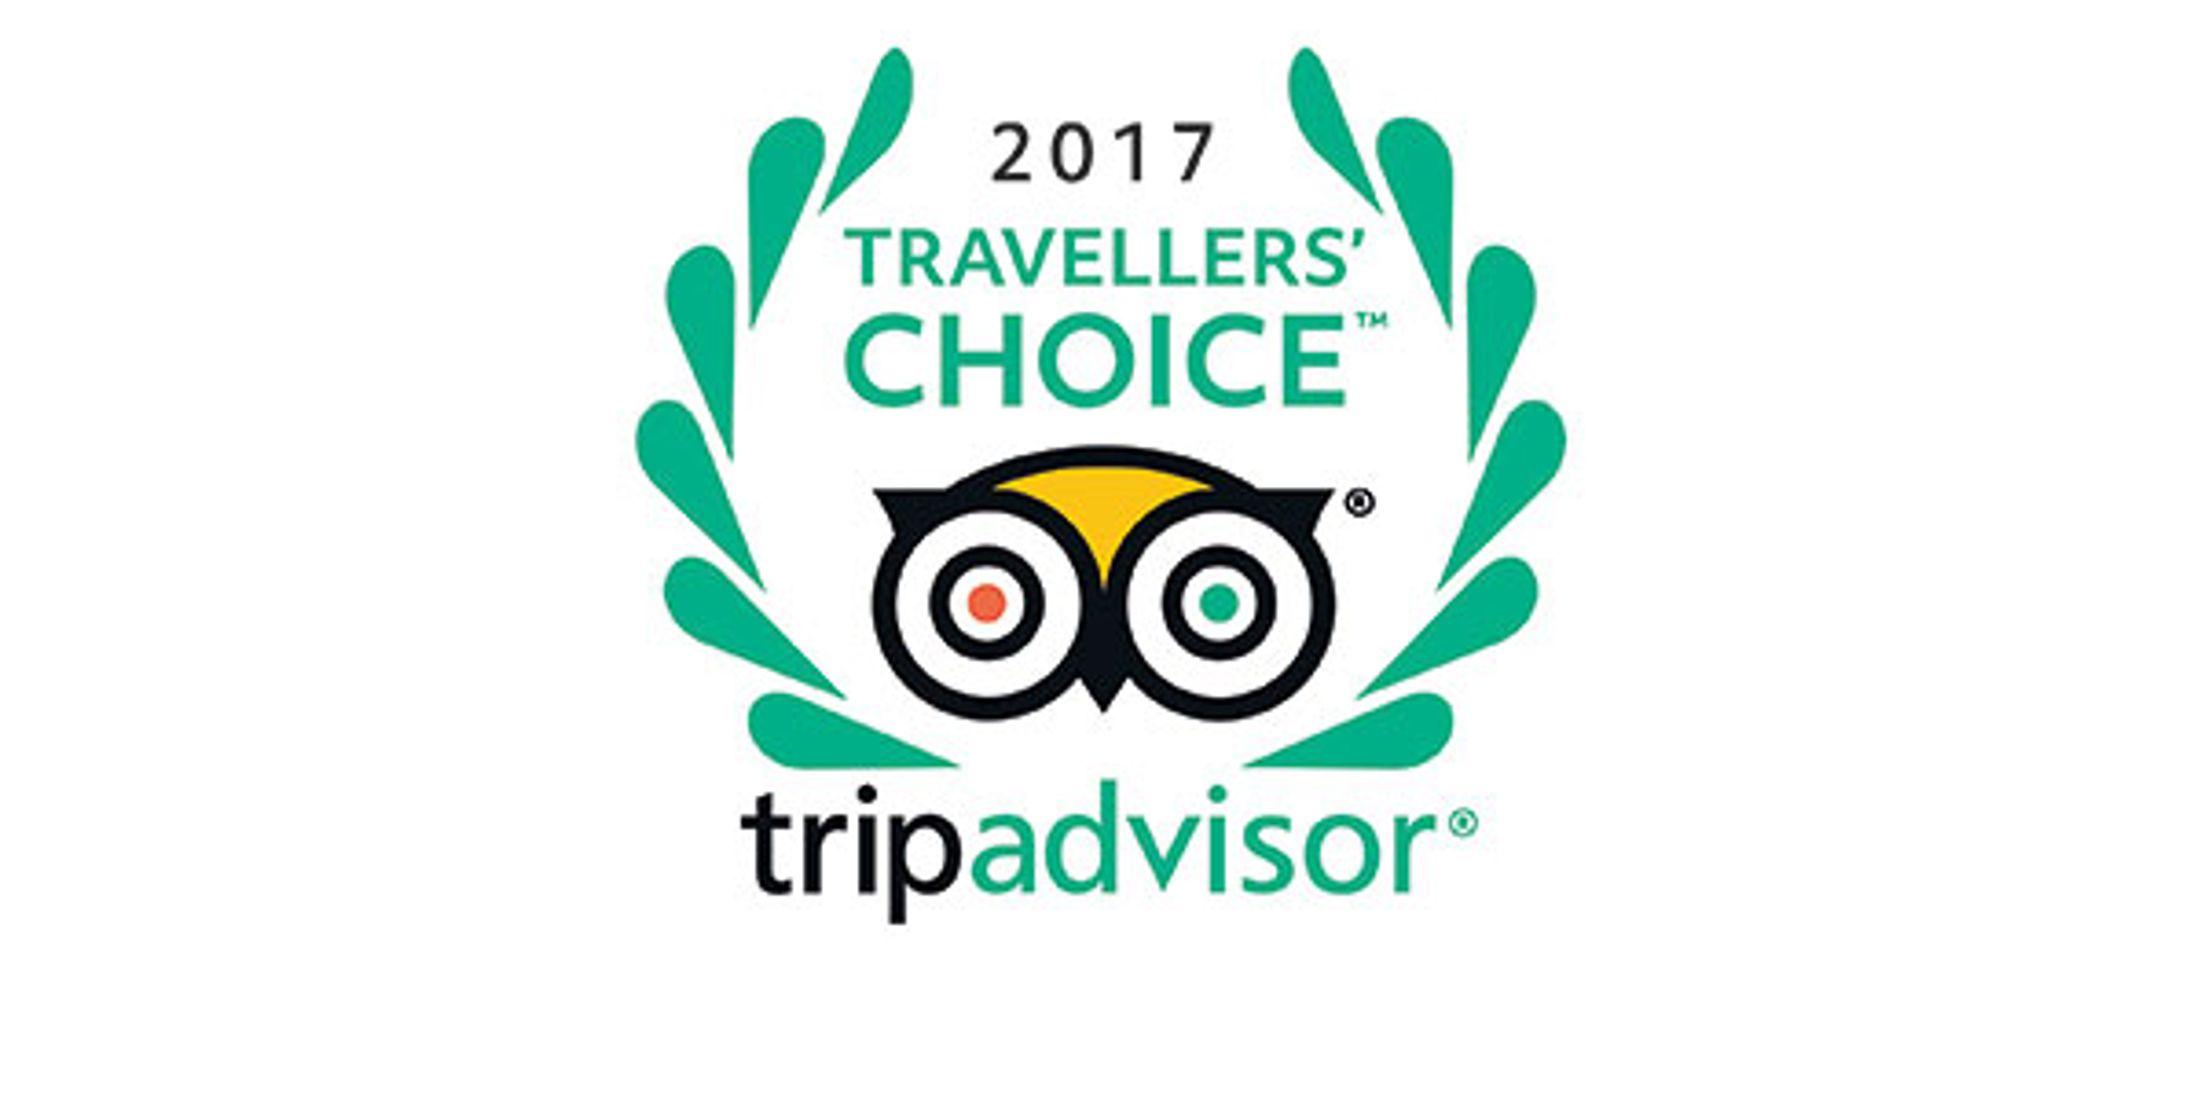 Tripadvisor Travellers Choice Award 2017